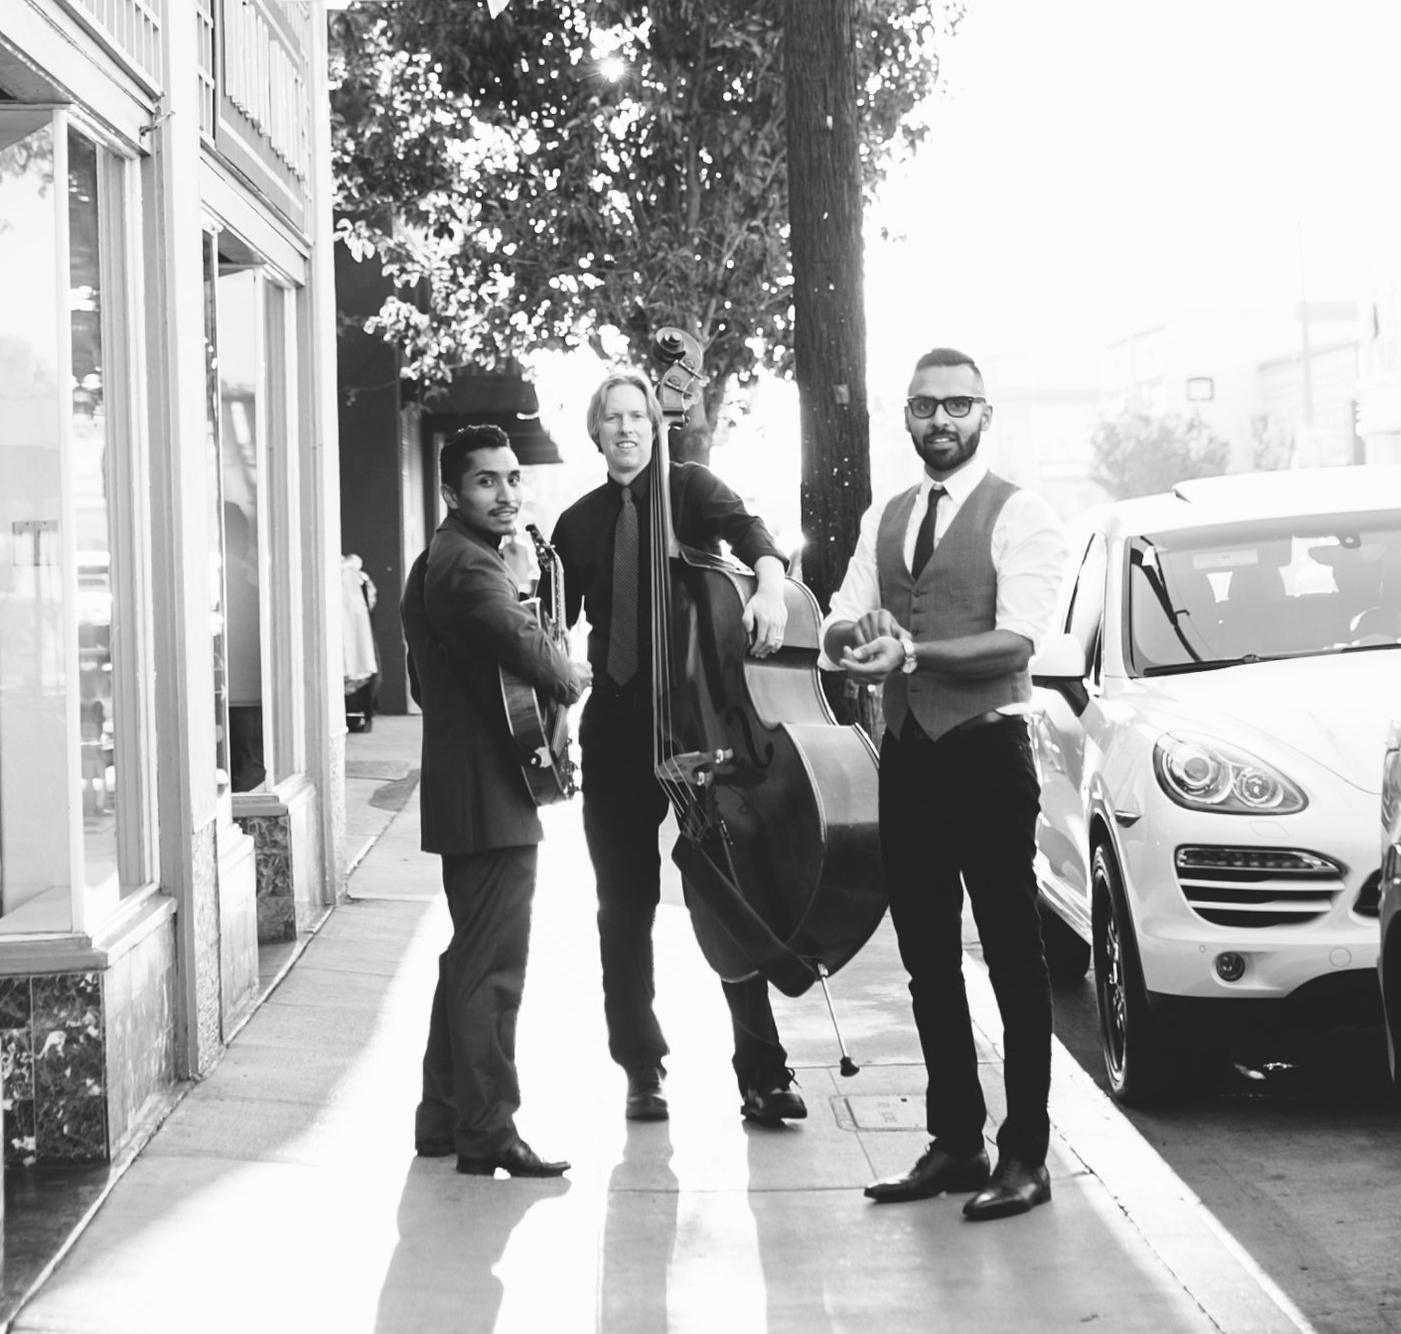 Photographer: Myra Kjer Photography  Musicians: Emilio Tello, Eddie Joe Vieyra, Sam Montooth  Location: 4th Street Vine, Long Beach, California